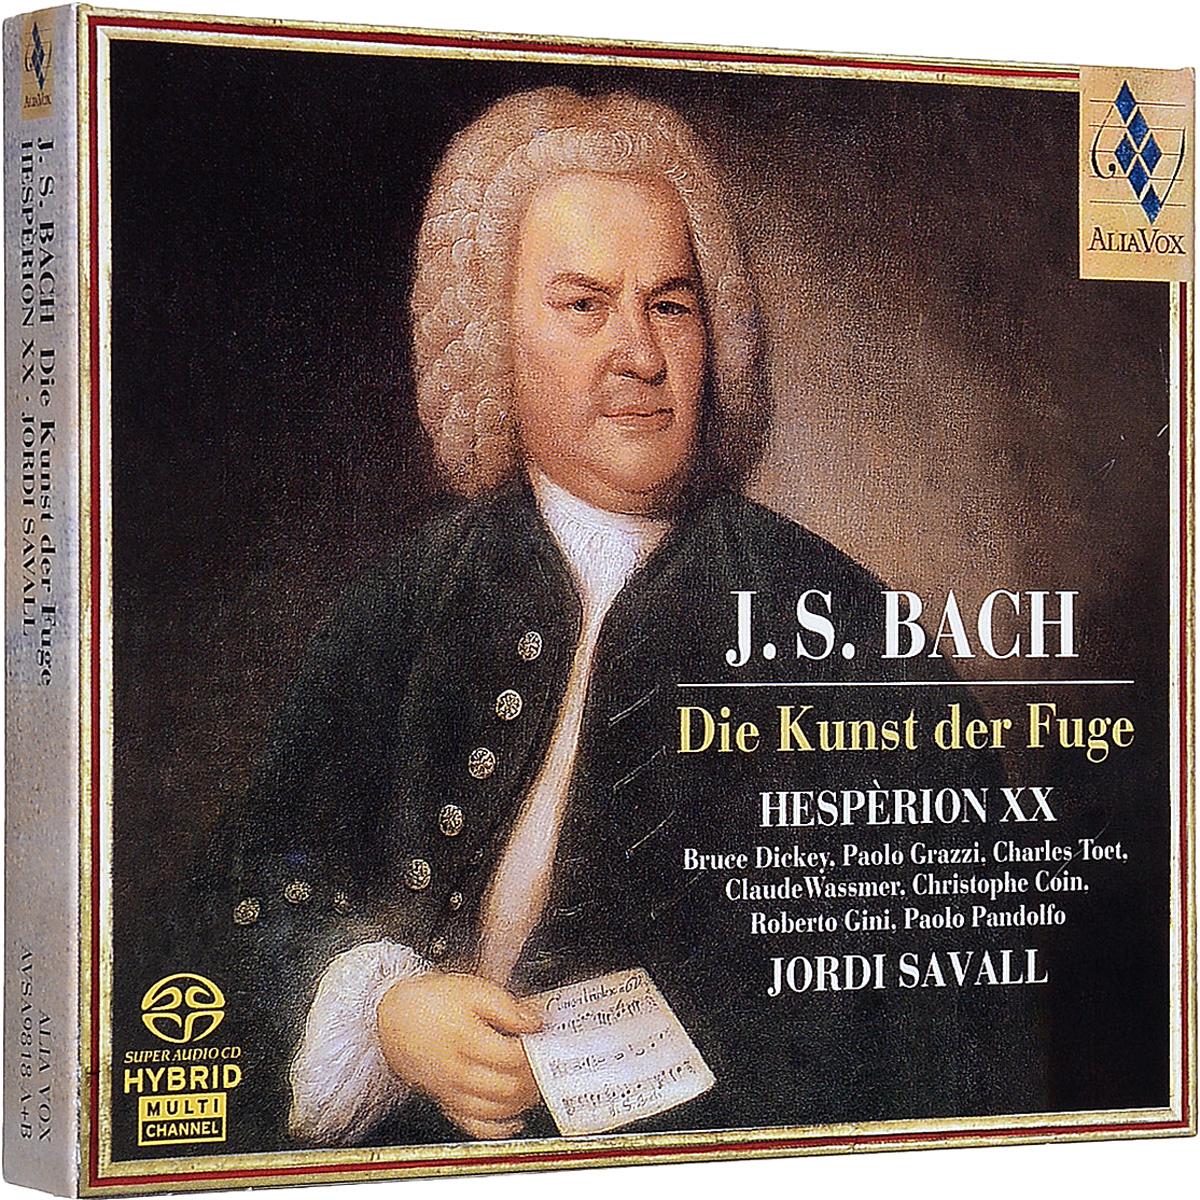 Хорди Саваль,Hesperion XX Jordi Savall, Hesperion XX. Bach. Die Kunst Der Fuge (2 CD)